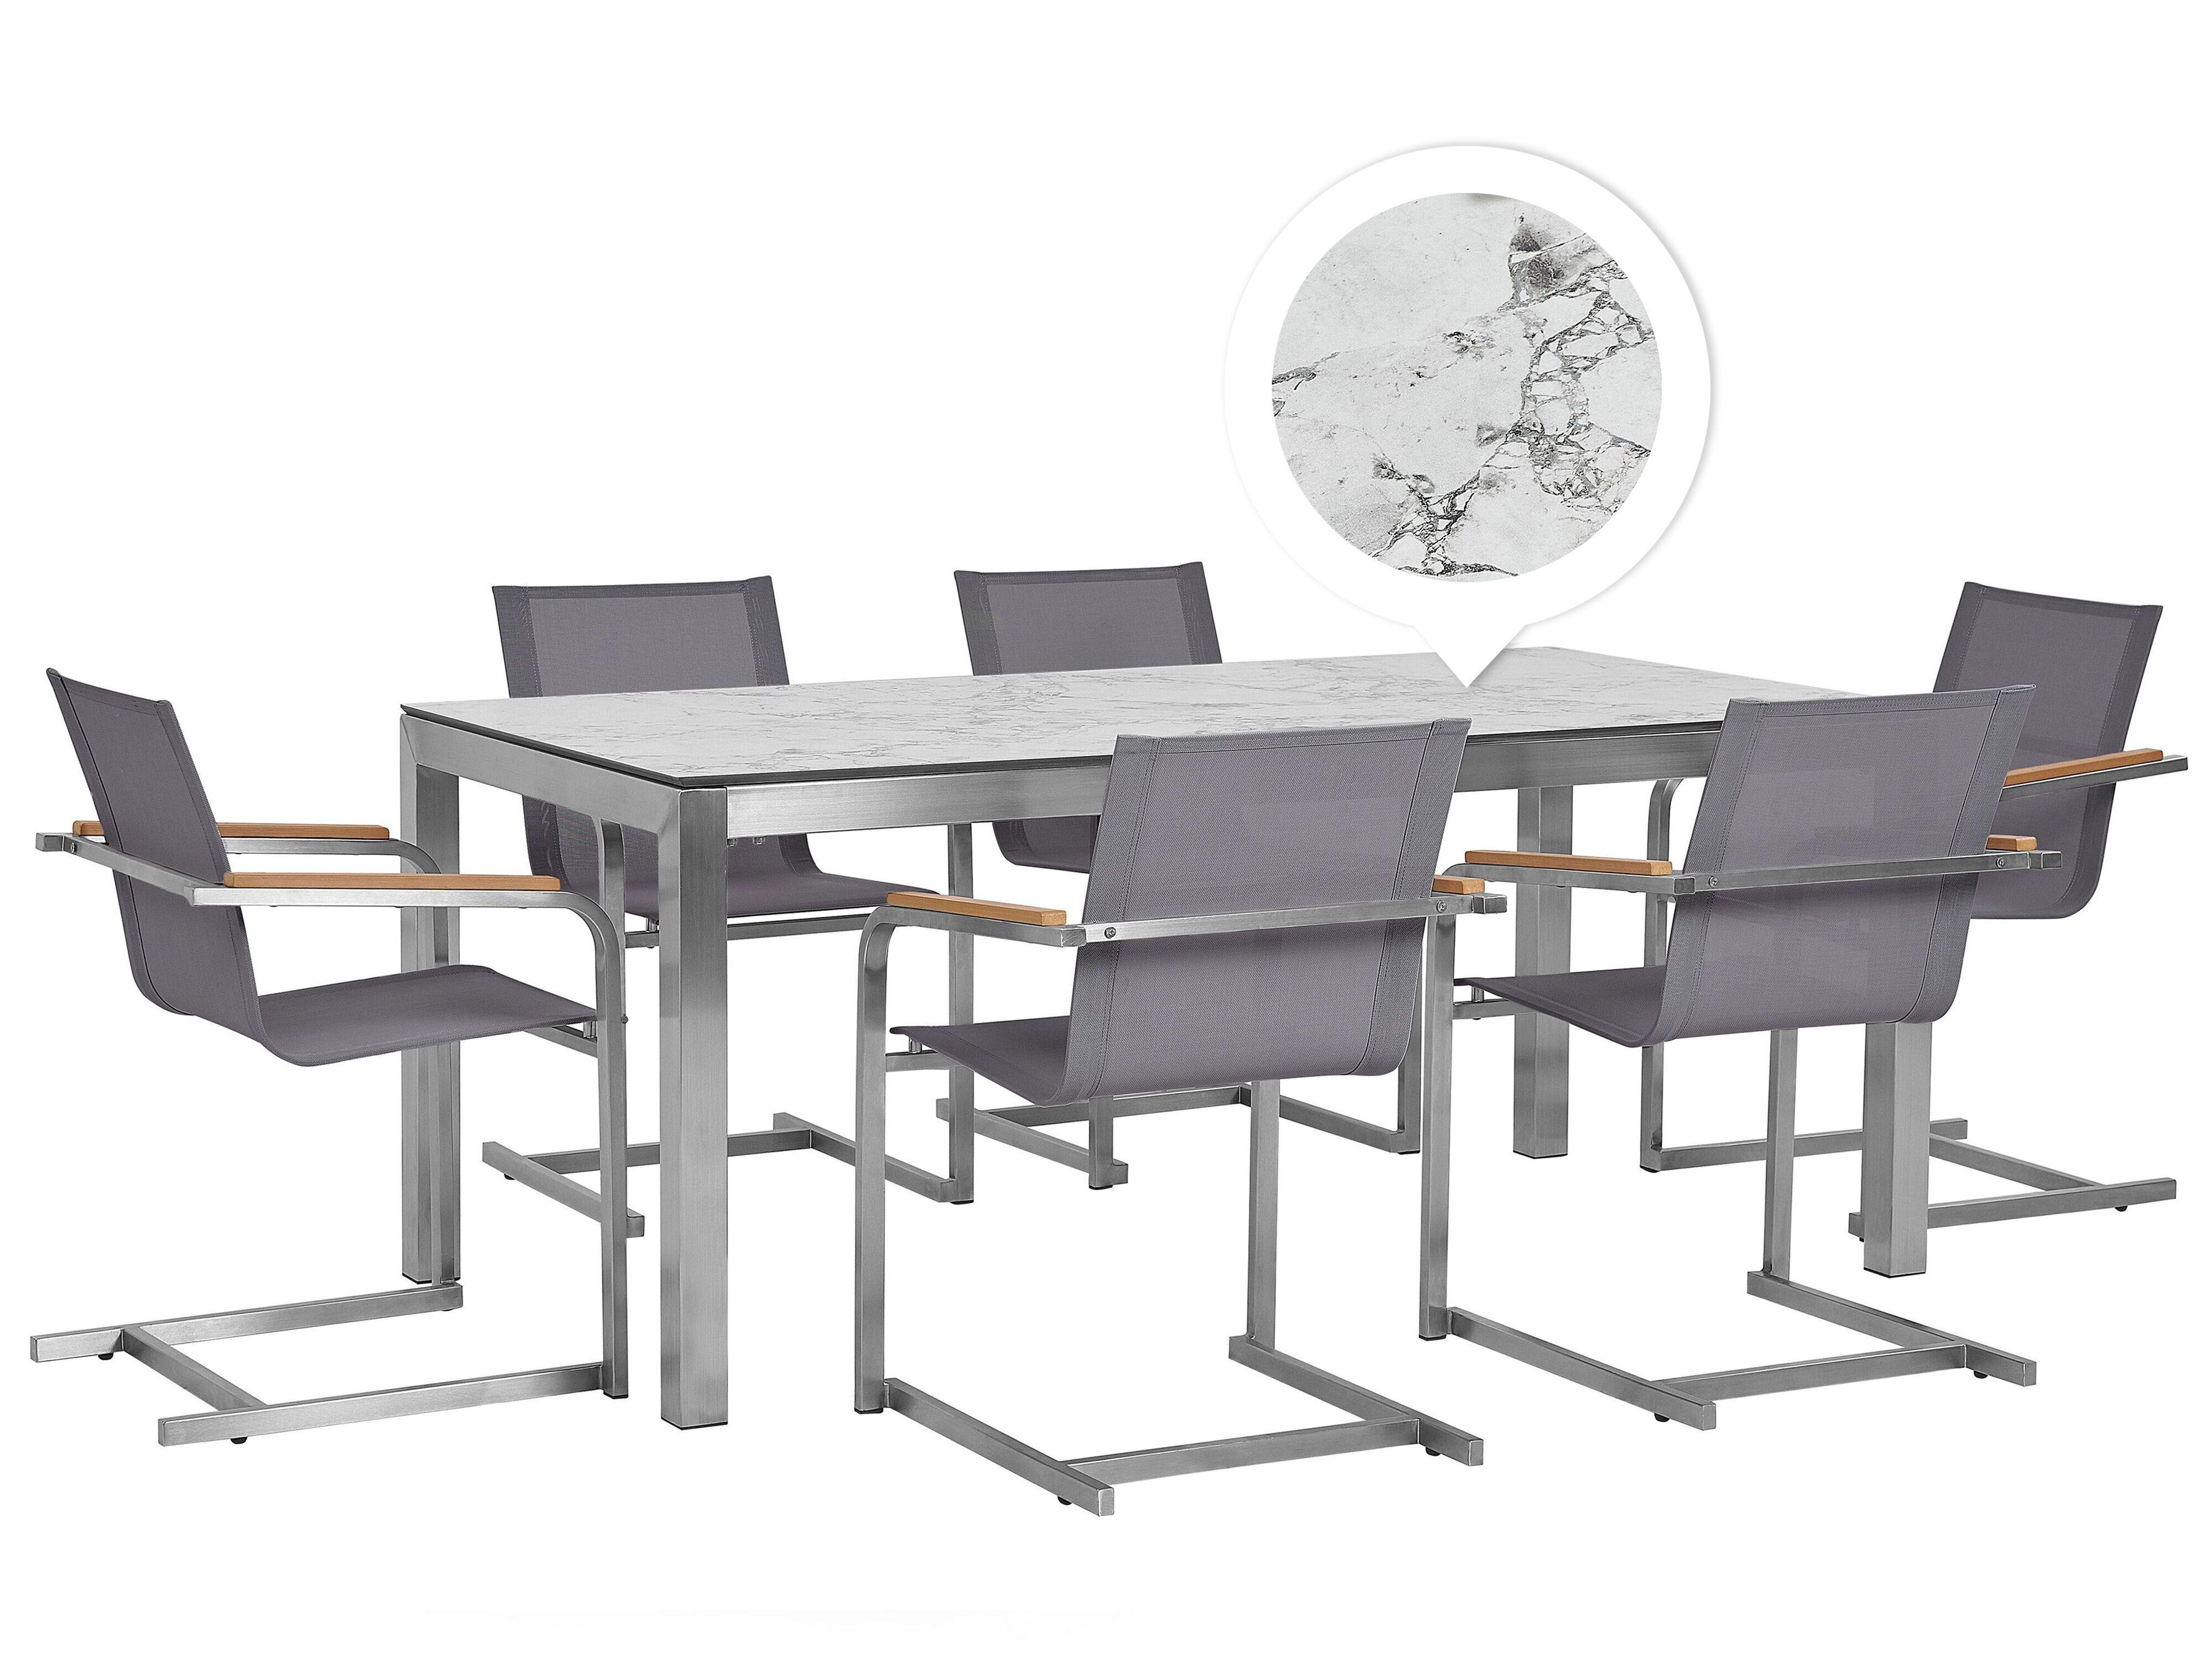 Gartenmobel Set Marmor Optik 180 Cm 6 Sitzer Textil Grau Grosseto Cosoleto Beliani De